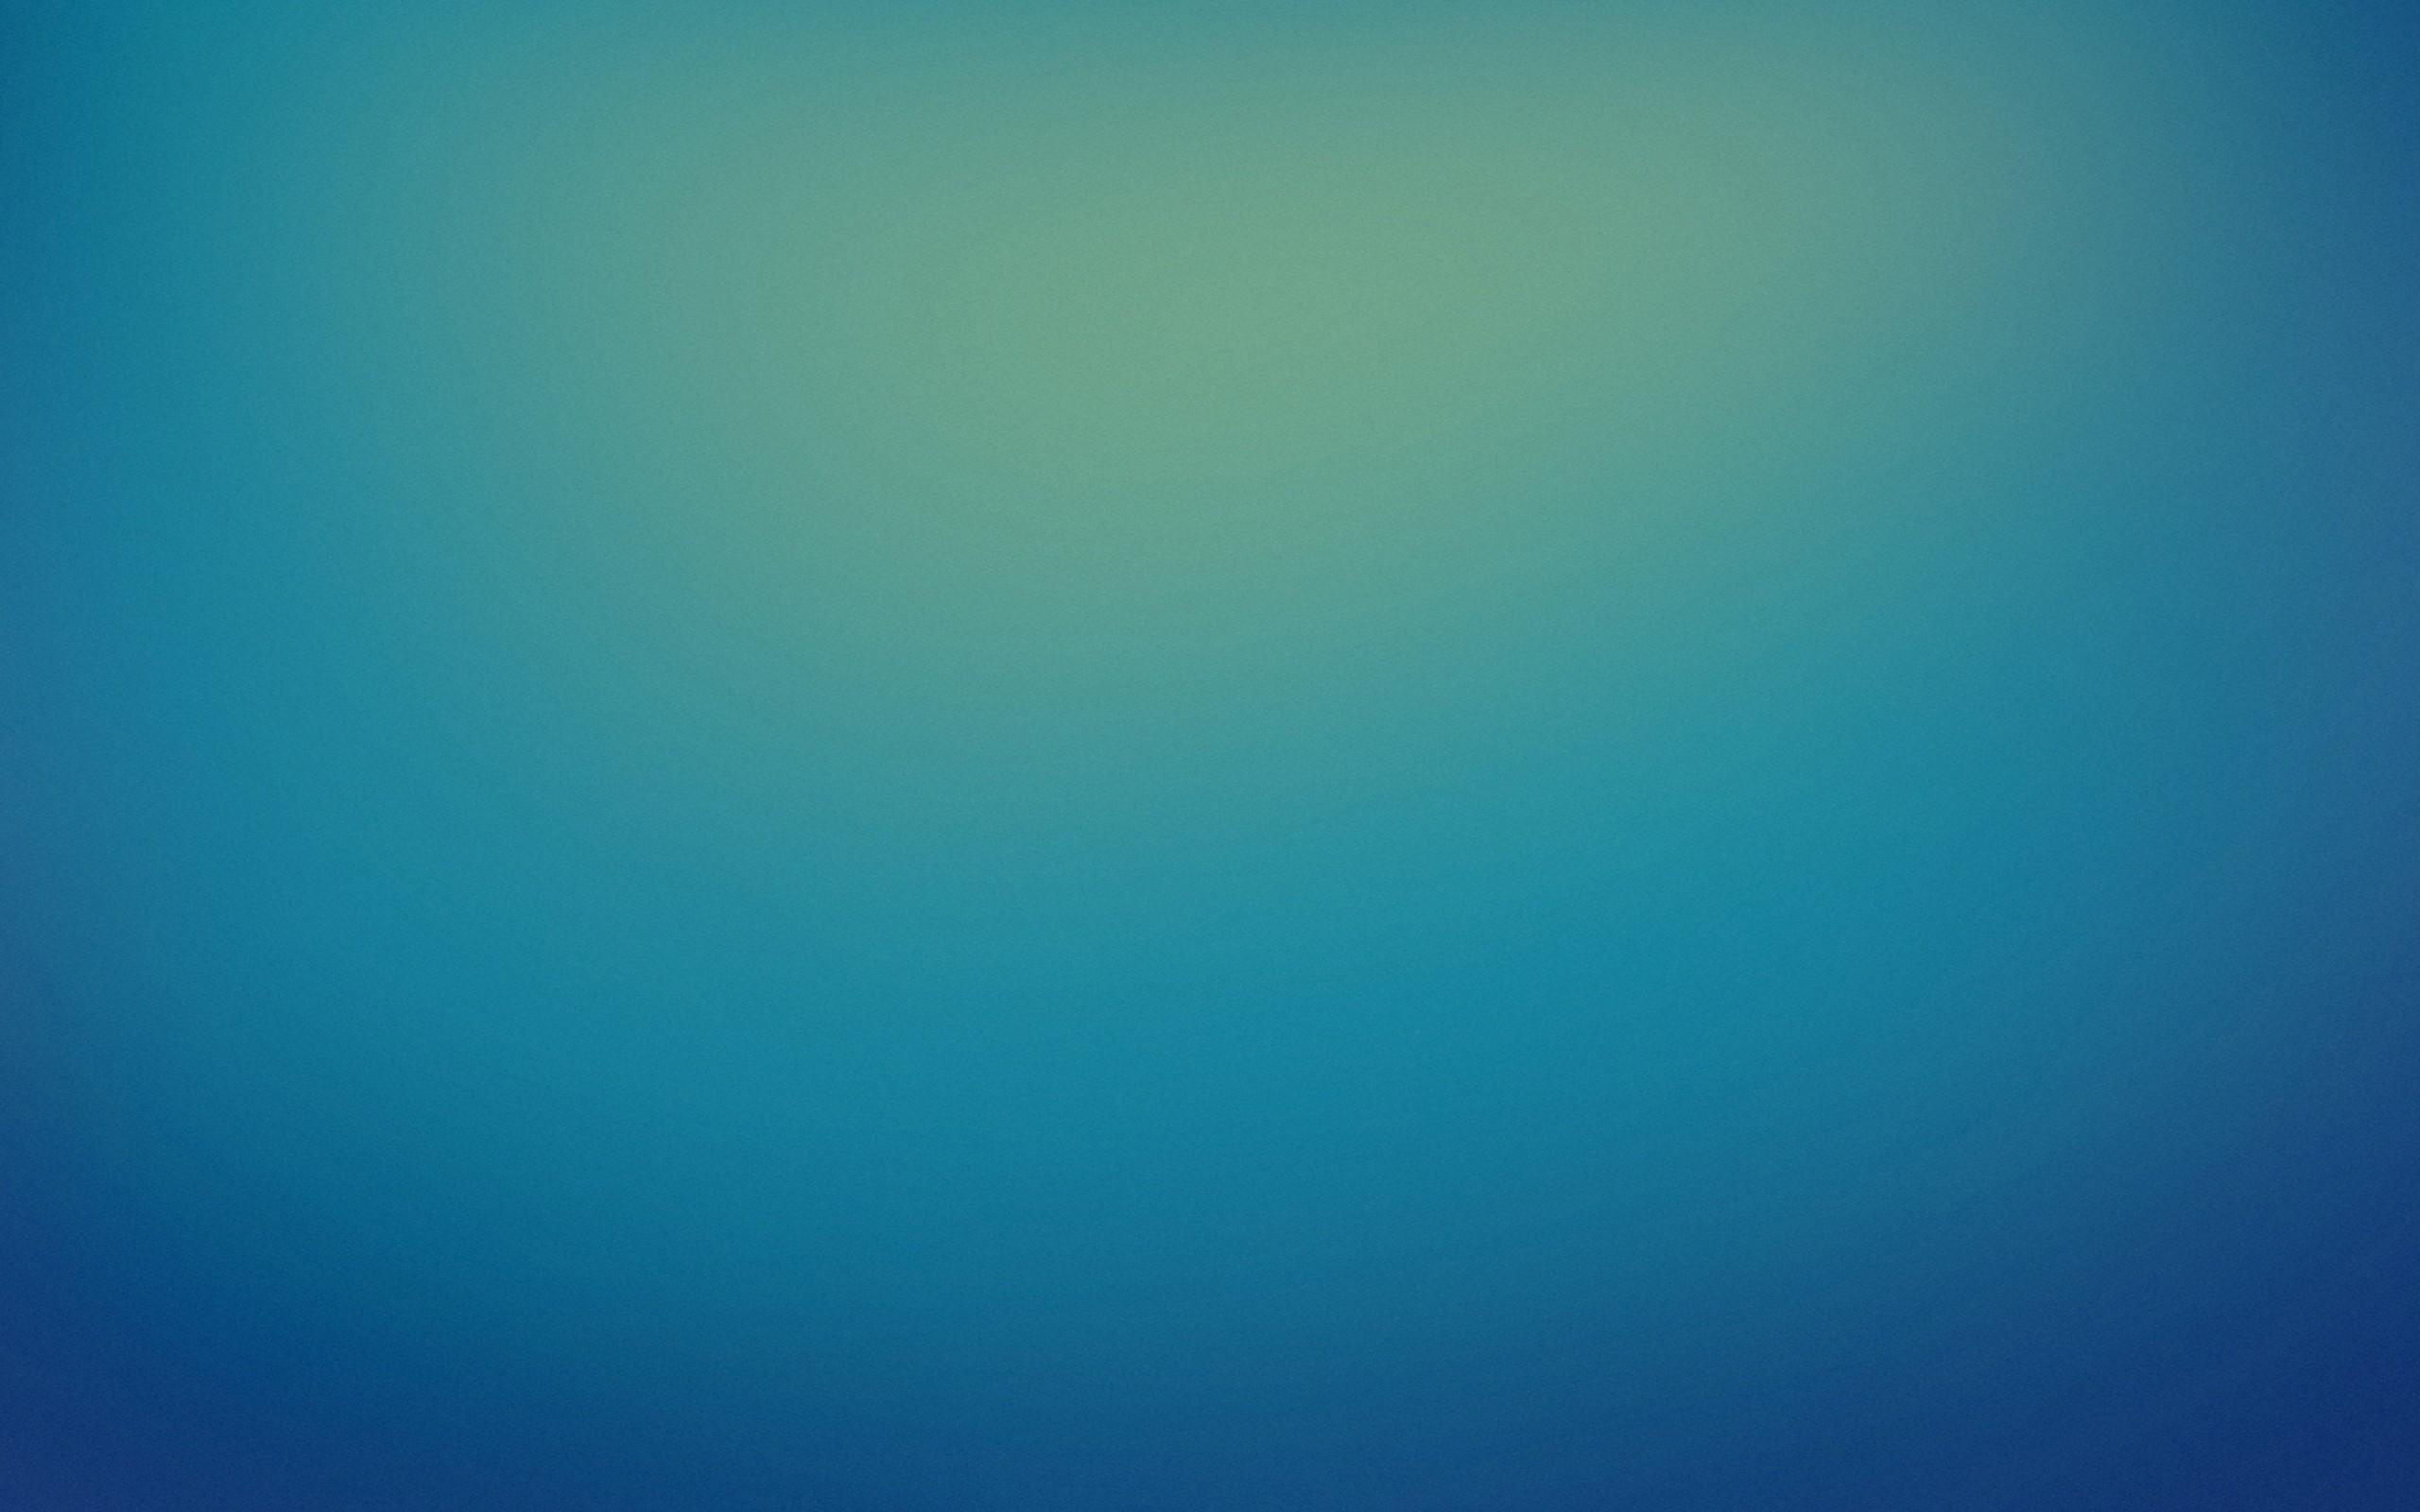 Wallpaper Spots, Background, Light, Solid, Color